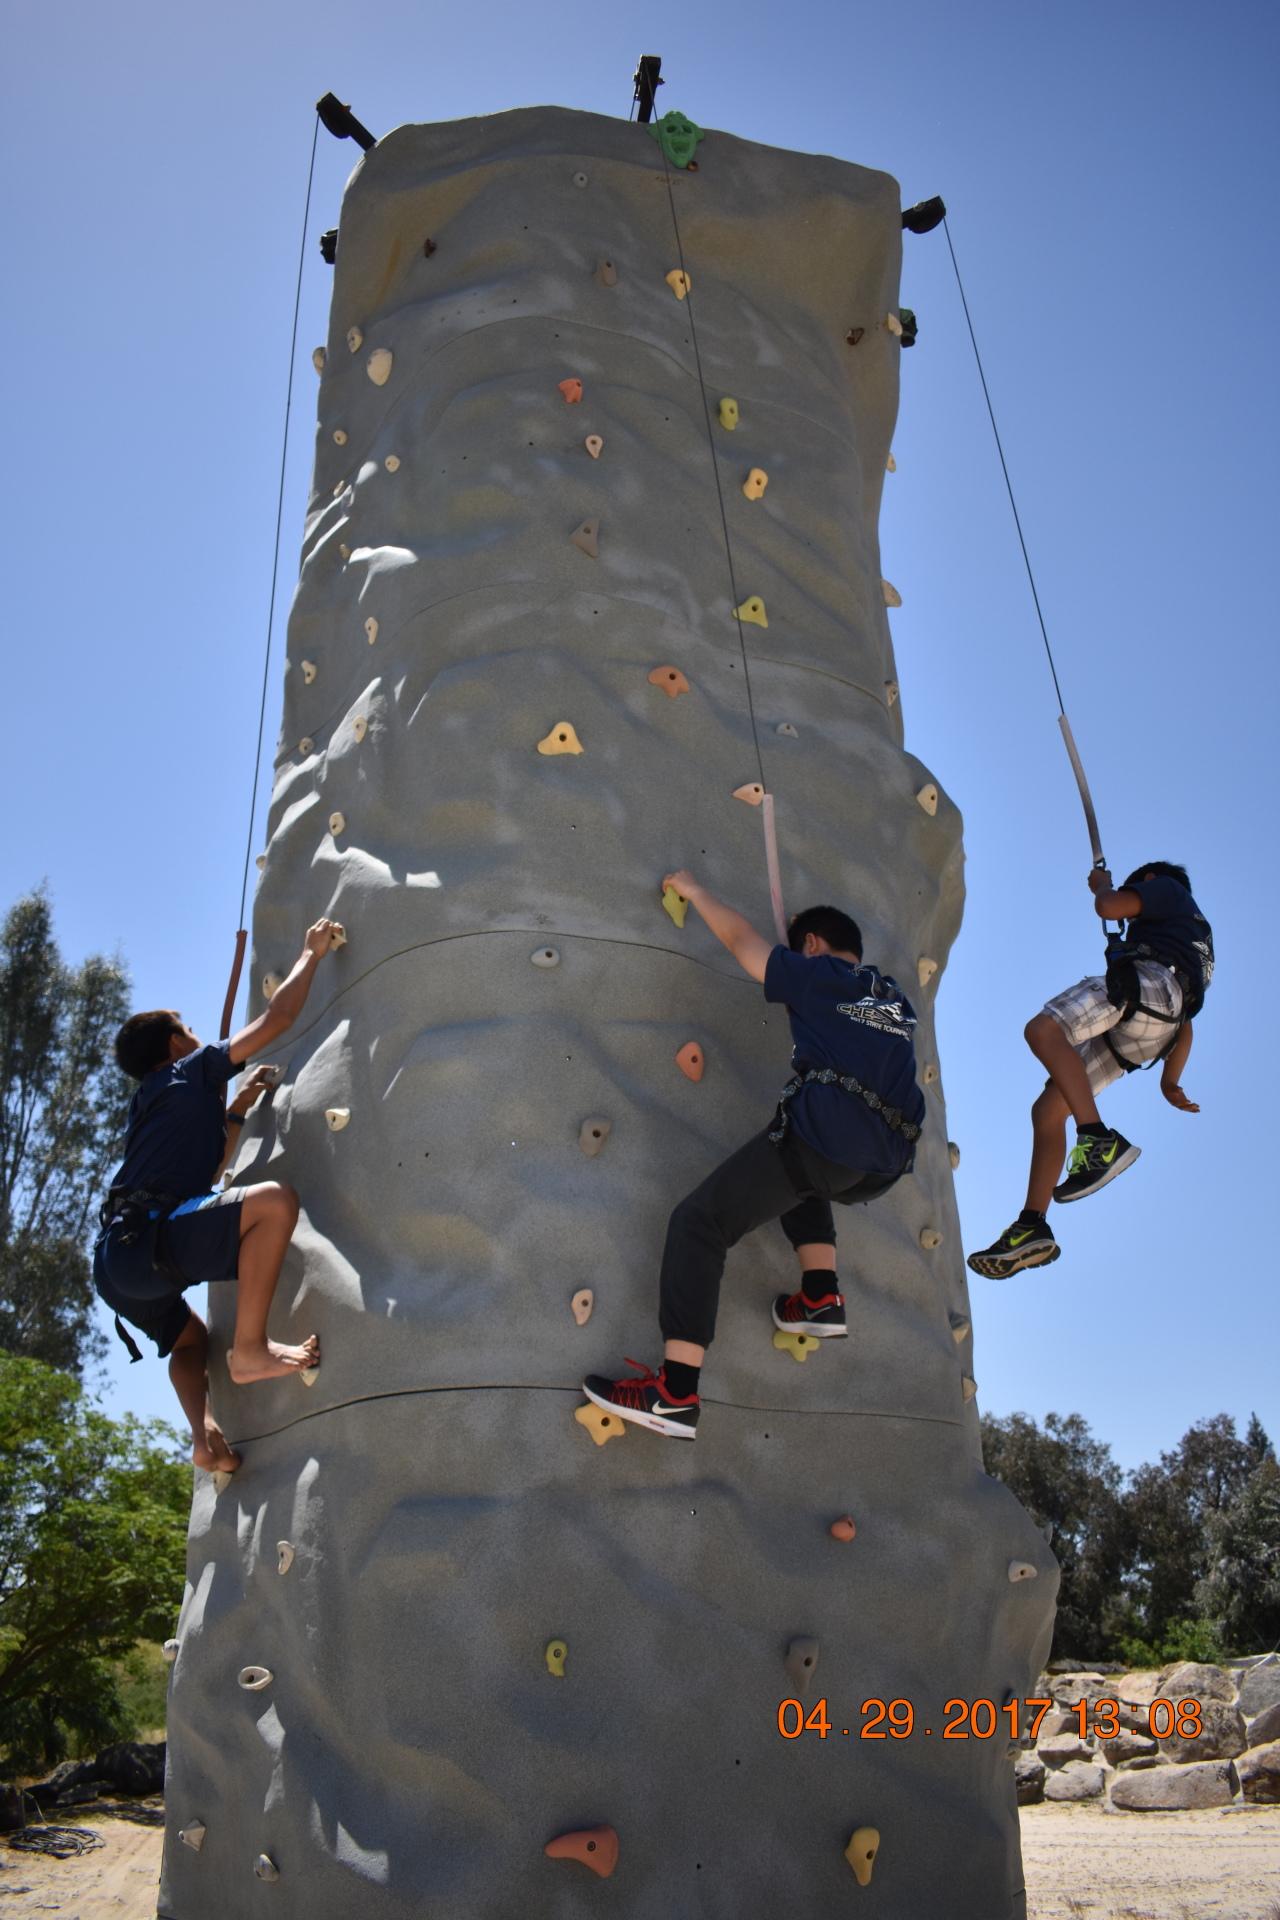 Climb the Giant Rook